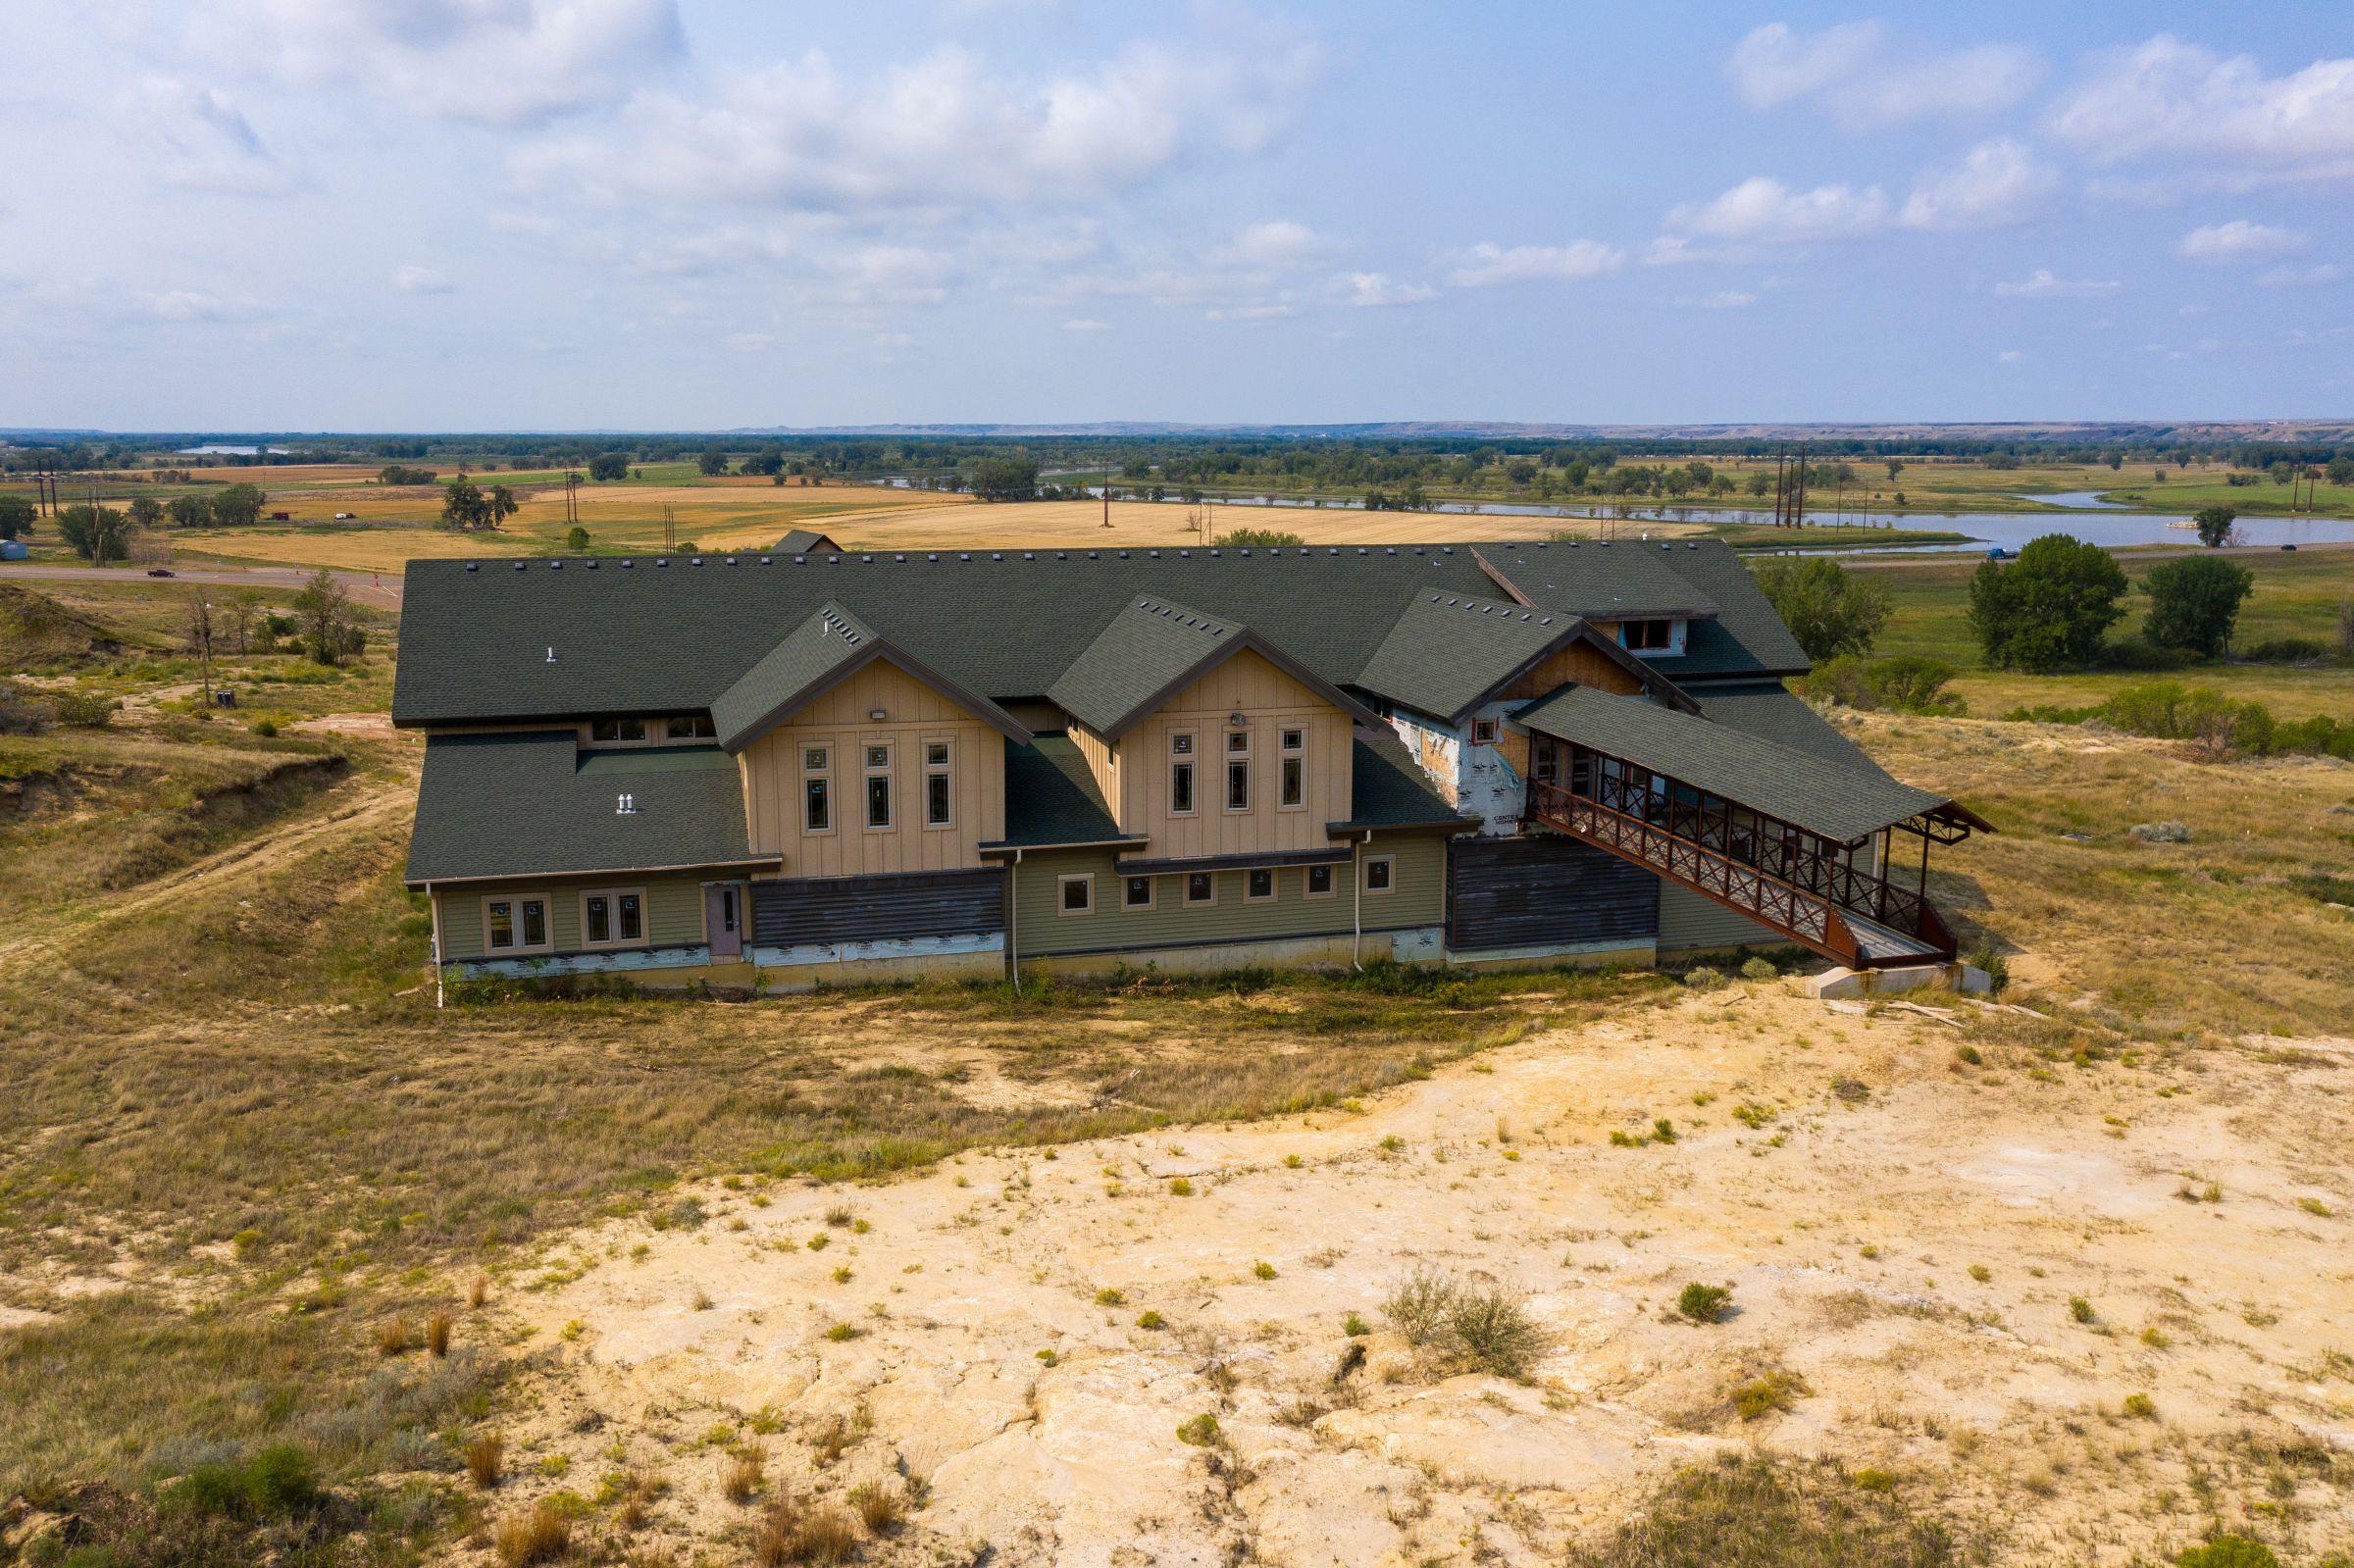 auctions-land-mckenzie-county-north-dakota-270-acres-listing-number-15735-2-2021-09-09-235542.jpeg